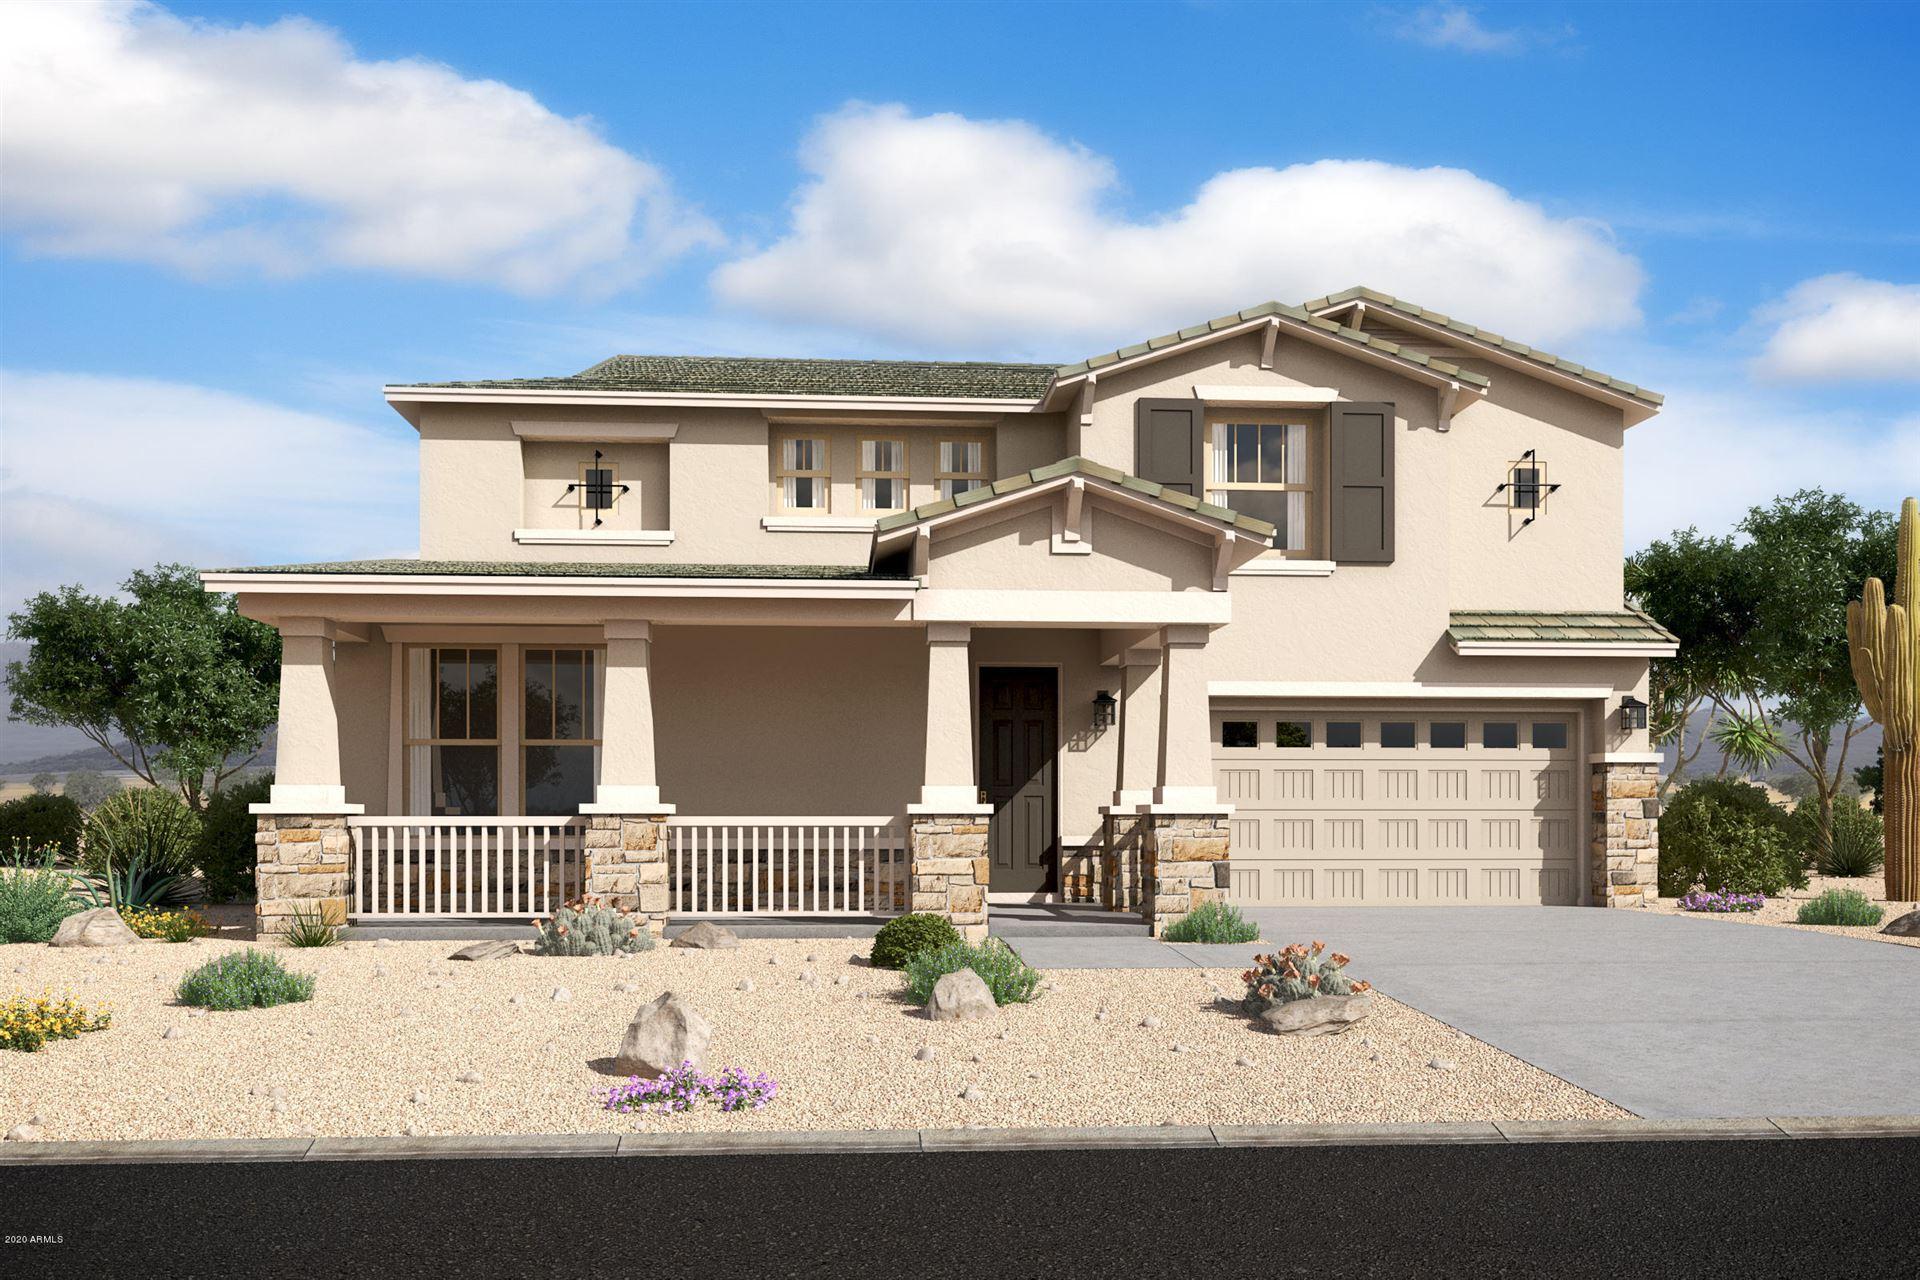 1362 E GEMINI Place, Chandler, AZ 85249 - #: 6092930